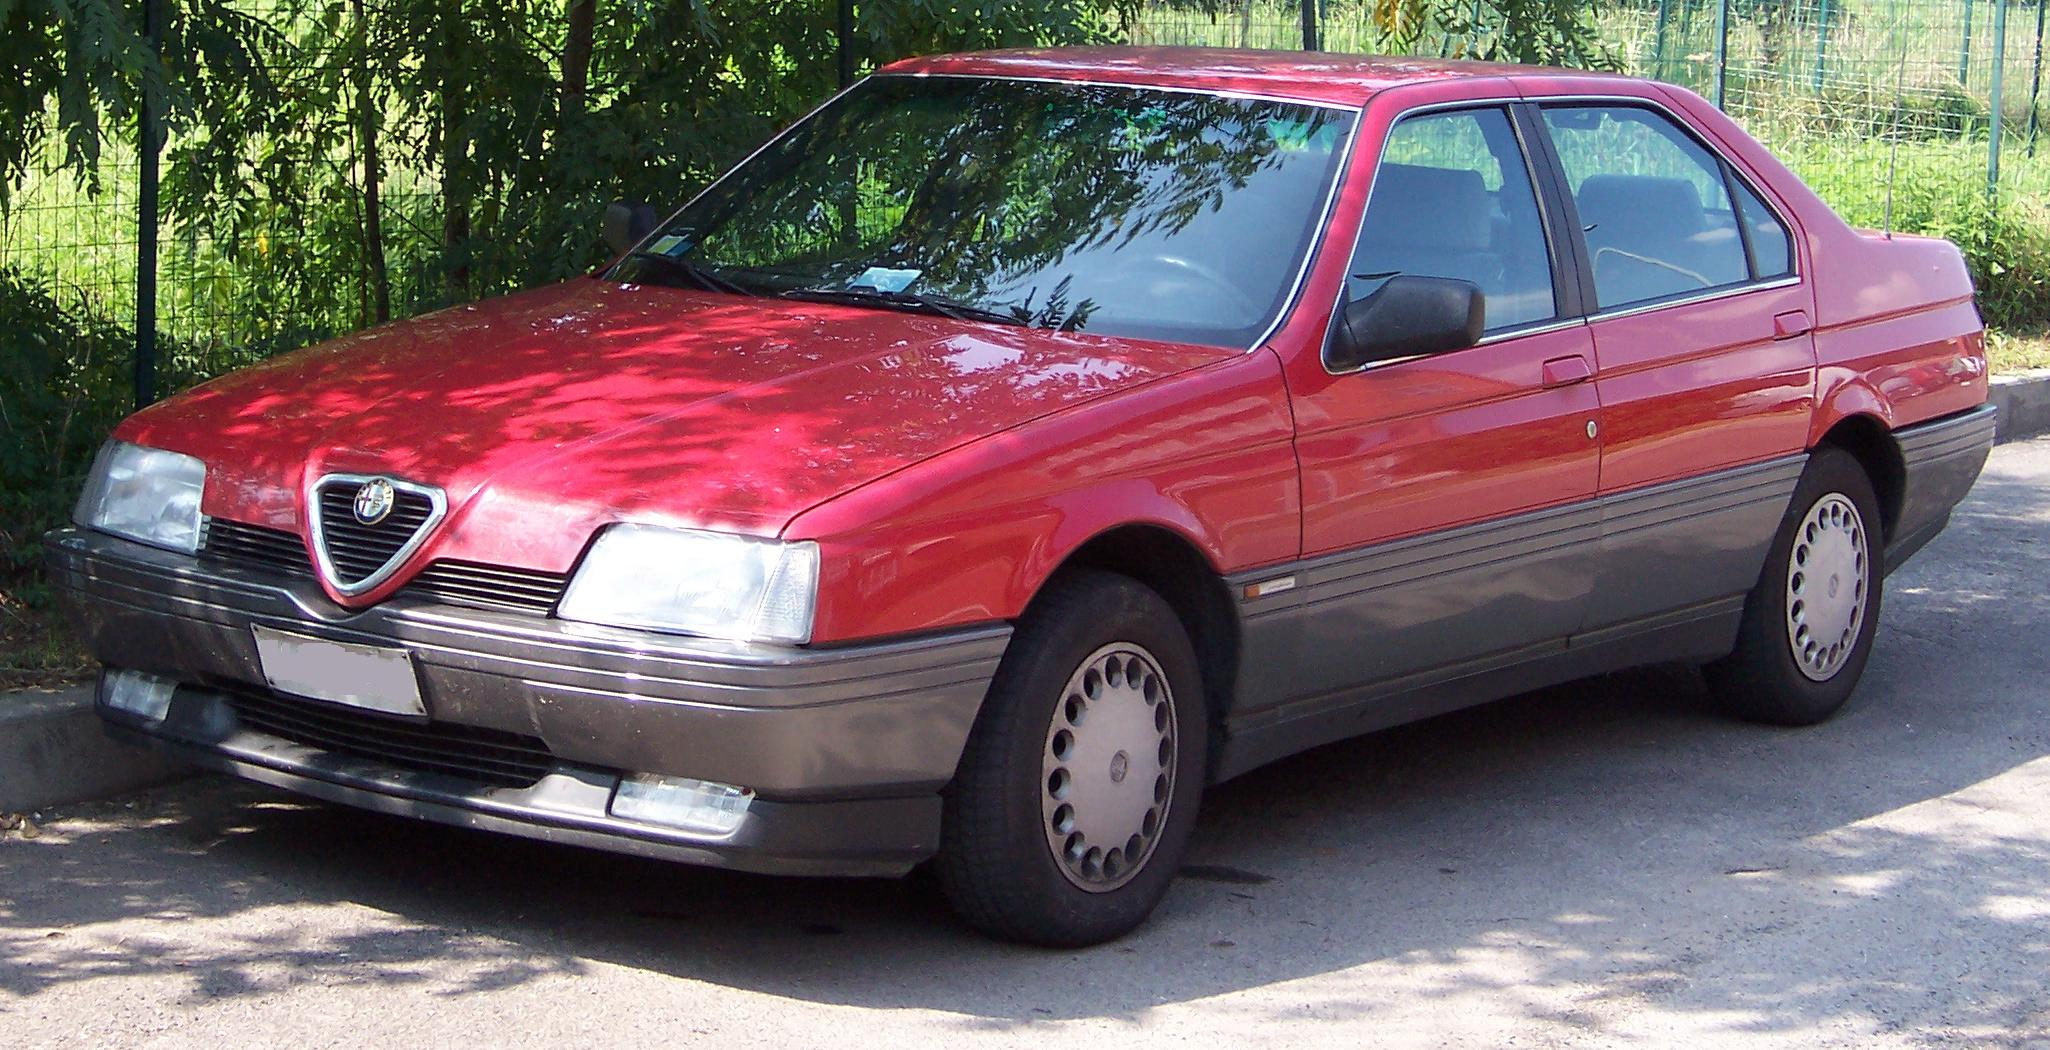 Alfa Romeo 164 >> File Alfaromeo 164 Front Jpg Wikimedia Commons